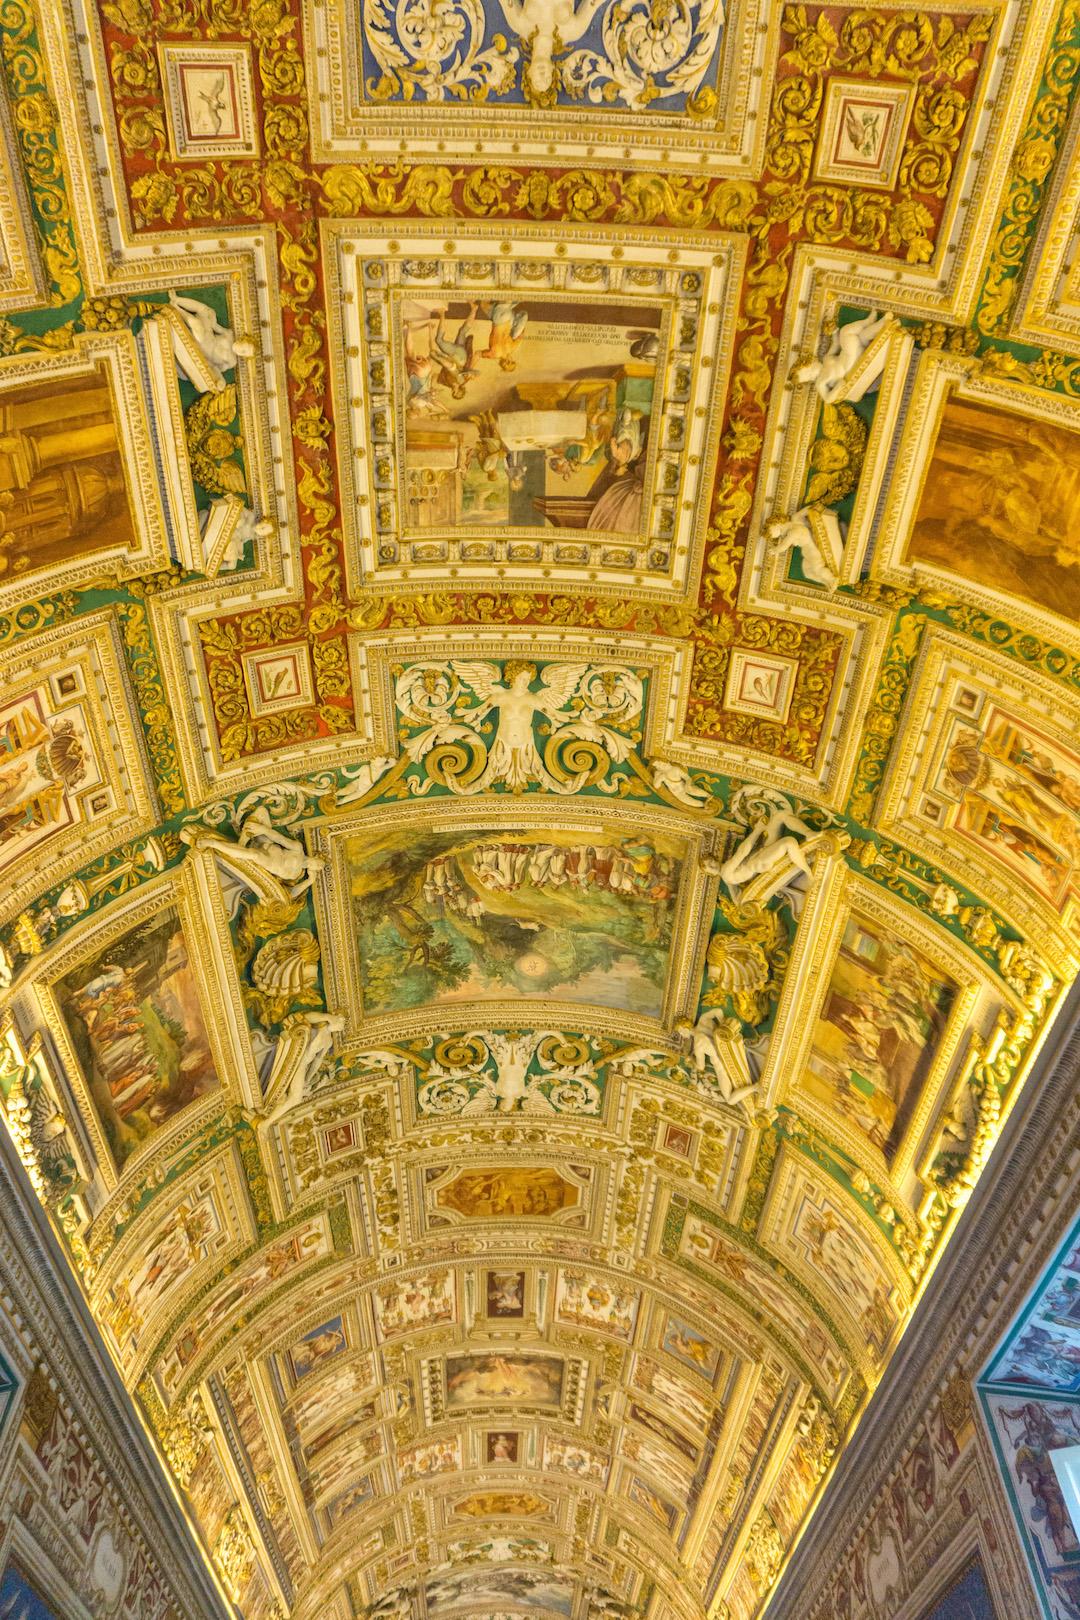 Her_Travel_Edit_Rome_Beautiful_Ceilings_Vatican